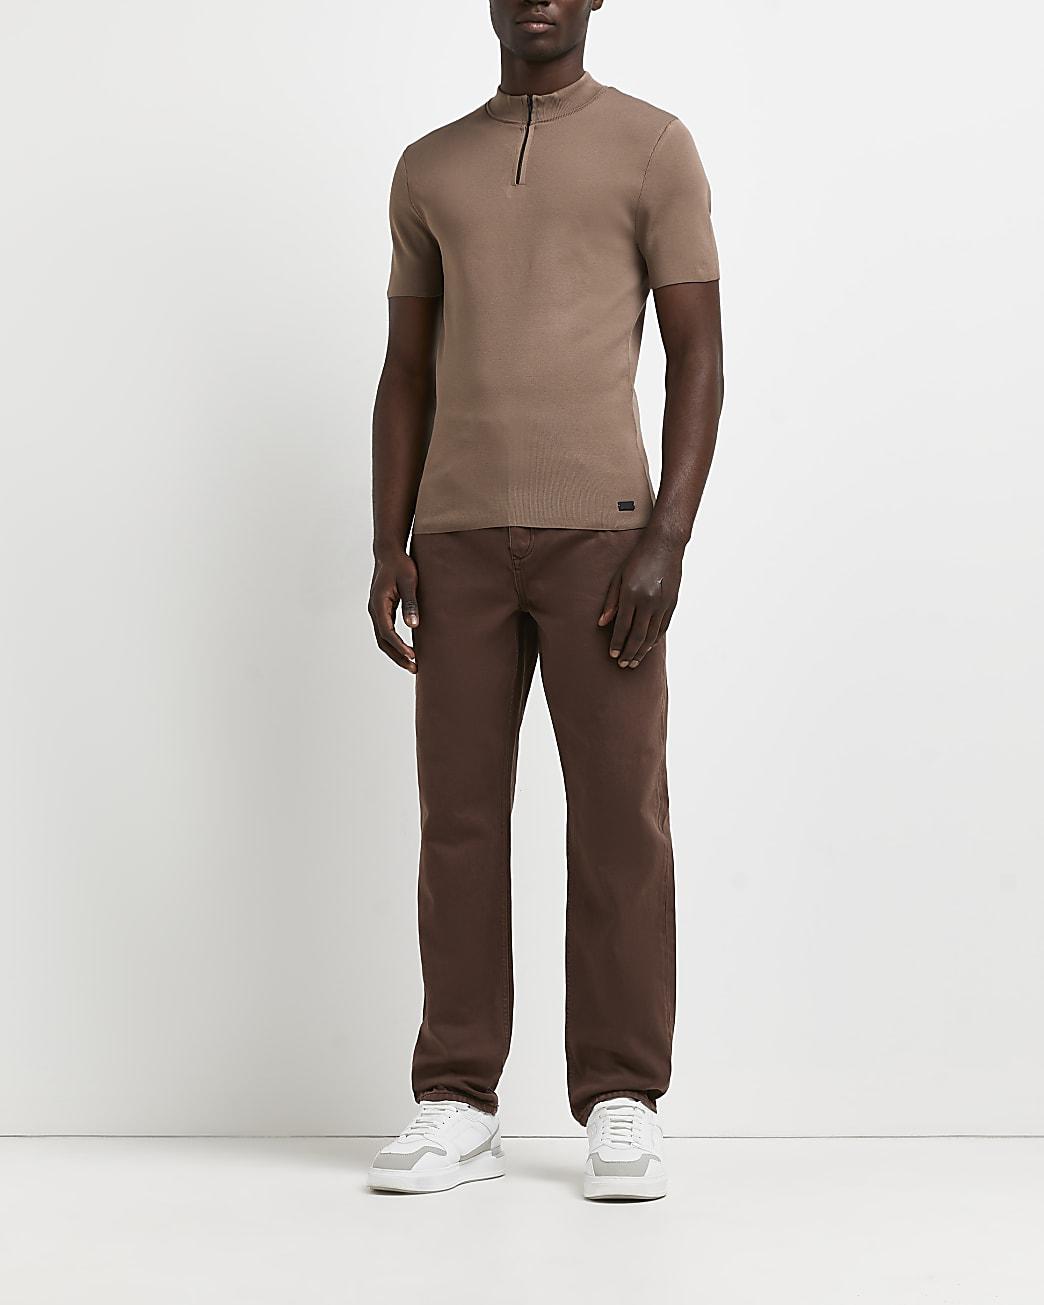 Brown slim fit half zip smart knitted t-shirt